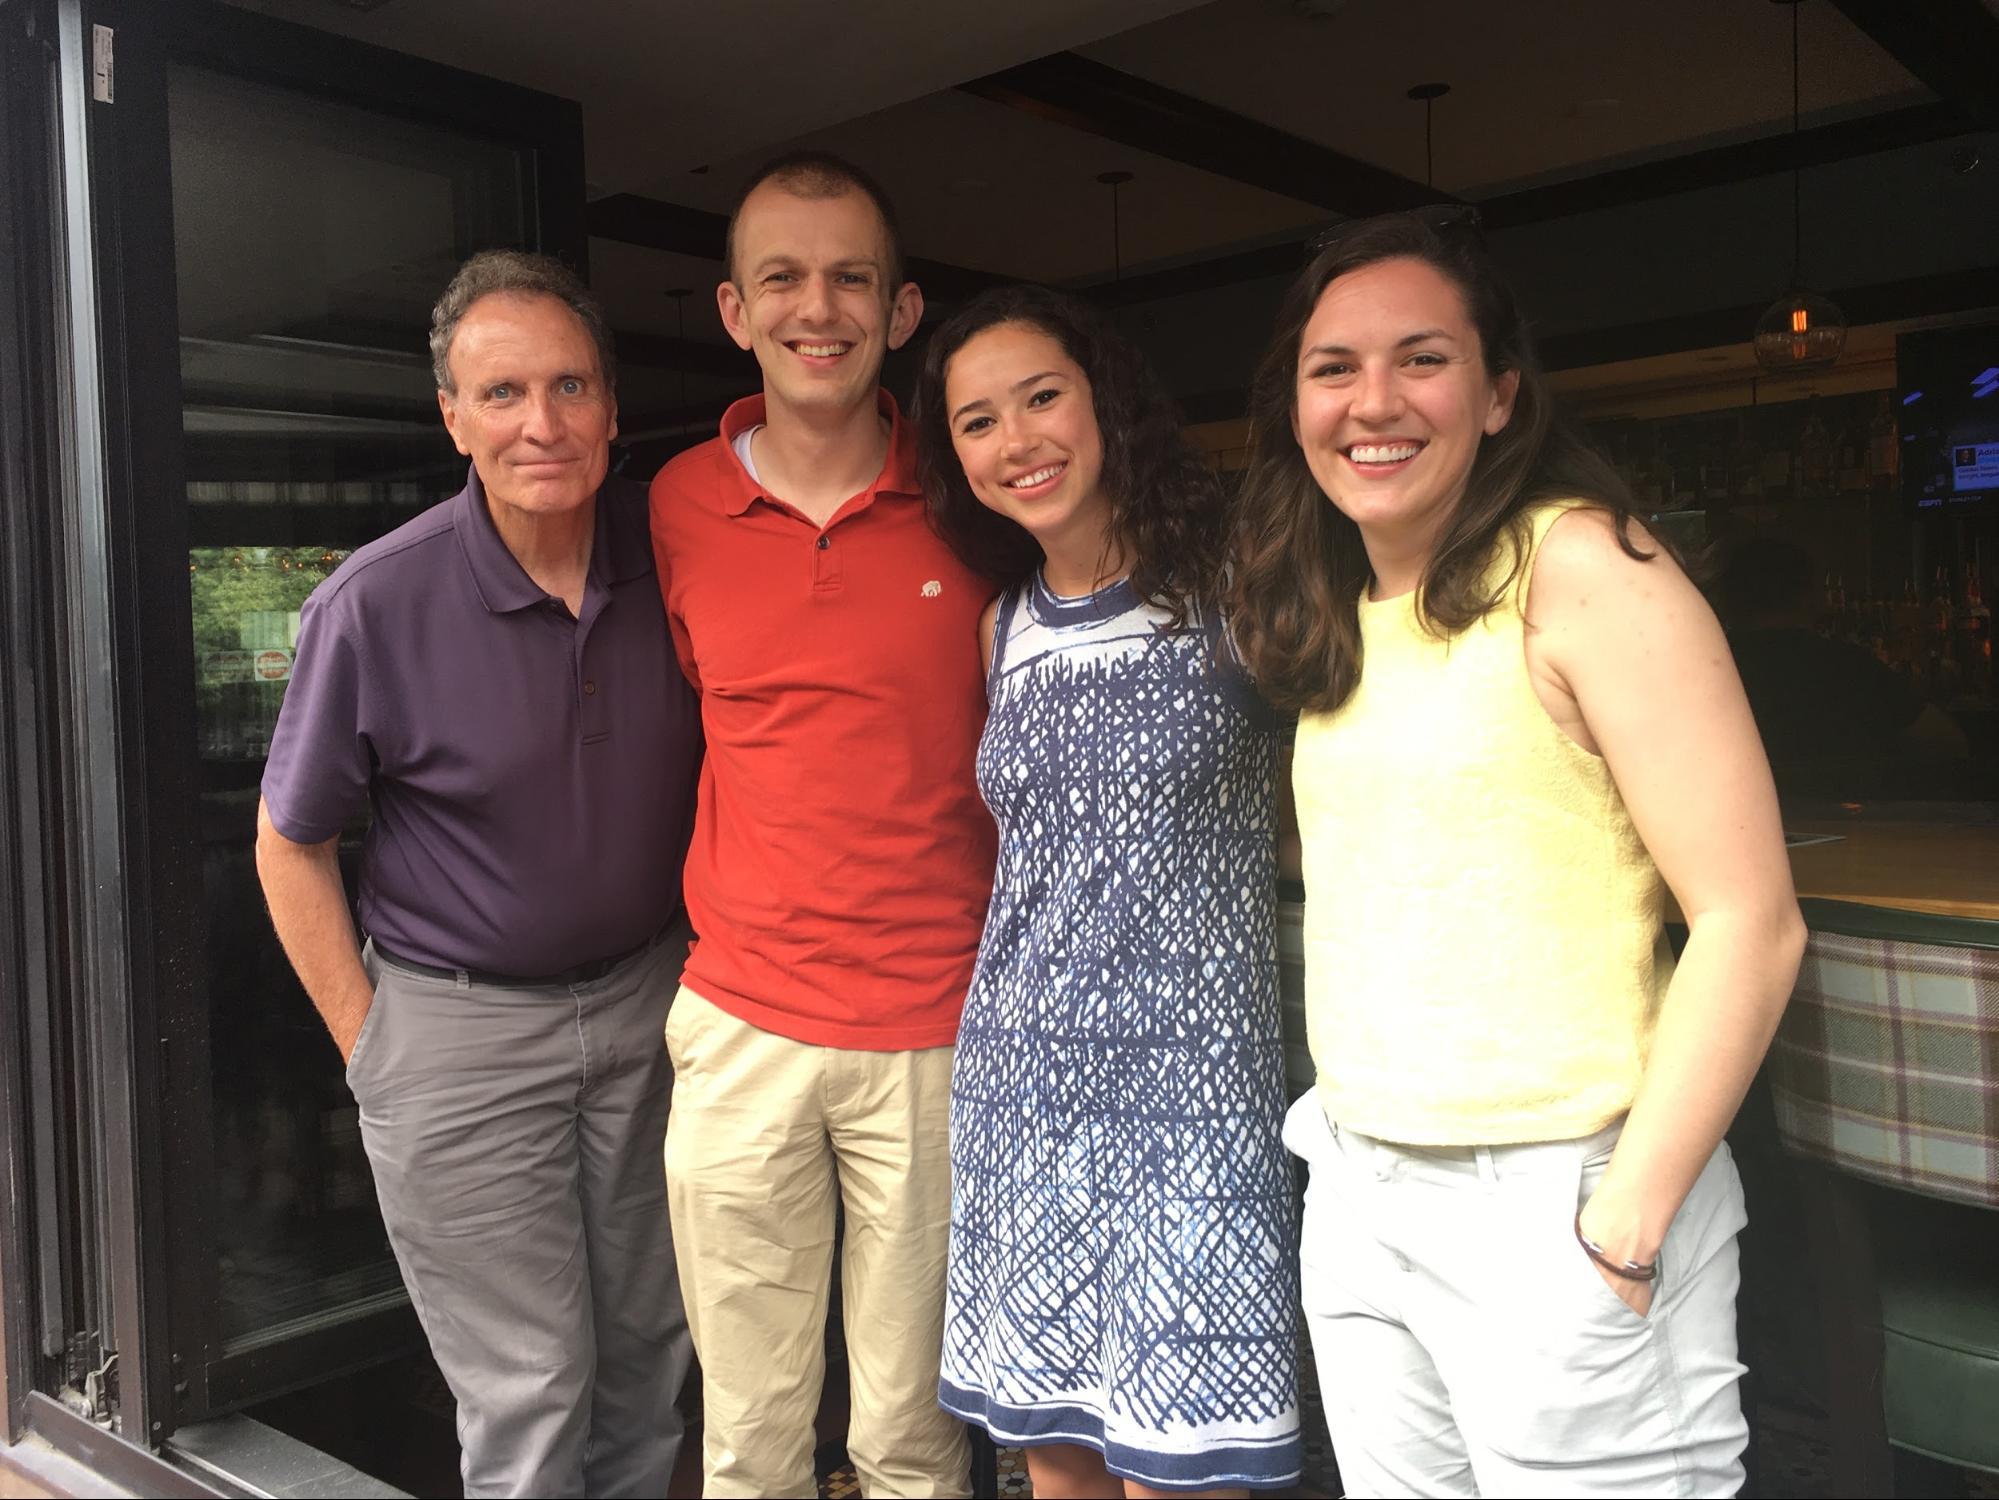 Nick Ascienzo (Founder), Alex Parks (RHHS '06), Kyla Gabriel (RHHS '13), & Betsy Kirtland (RHHS '12)